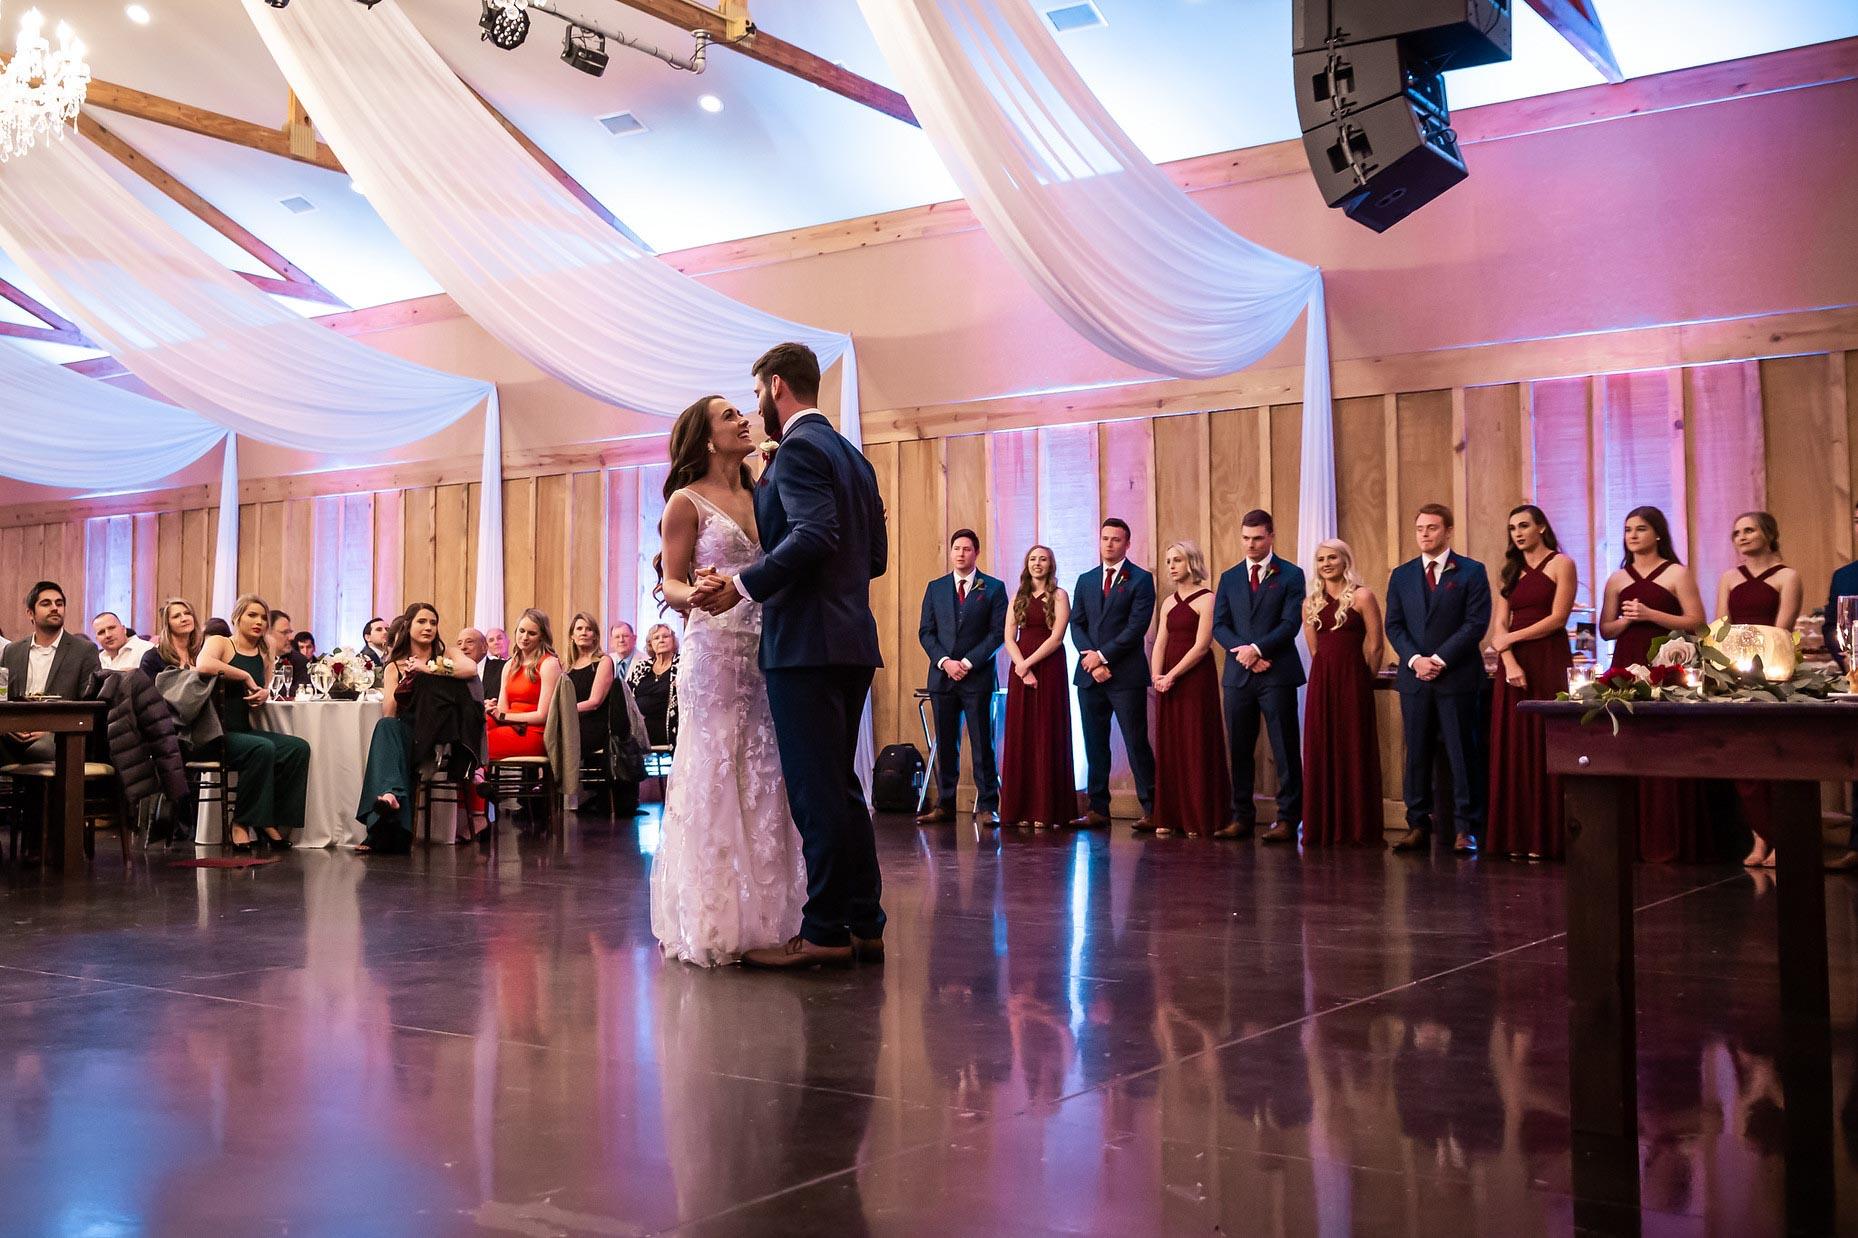 adam-szarmack-bowing-oaks-wedding-photographer-jacksonville-117.jpg